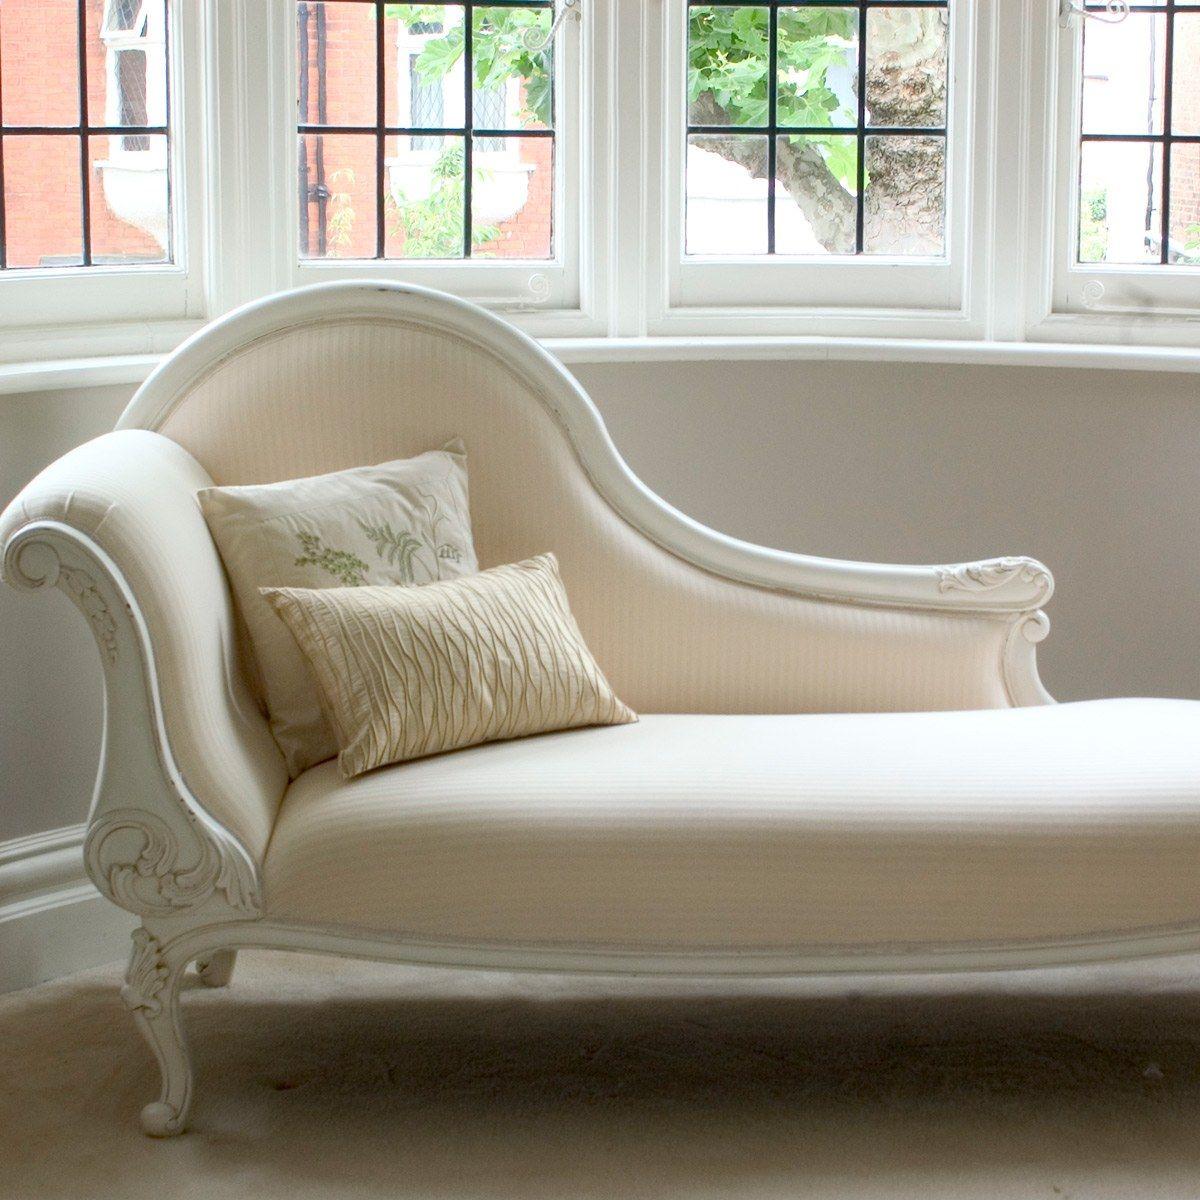 Classical White Chaise Longue Modern chaise lounge